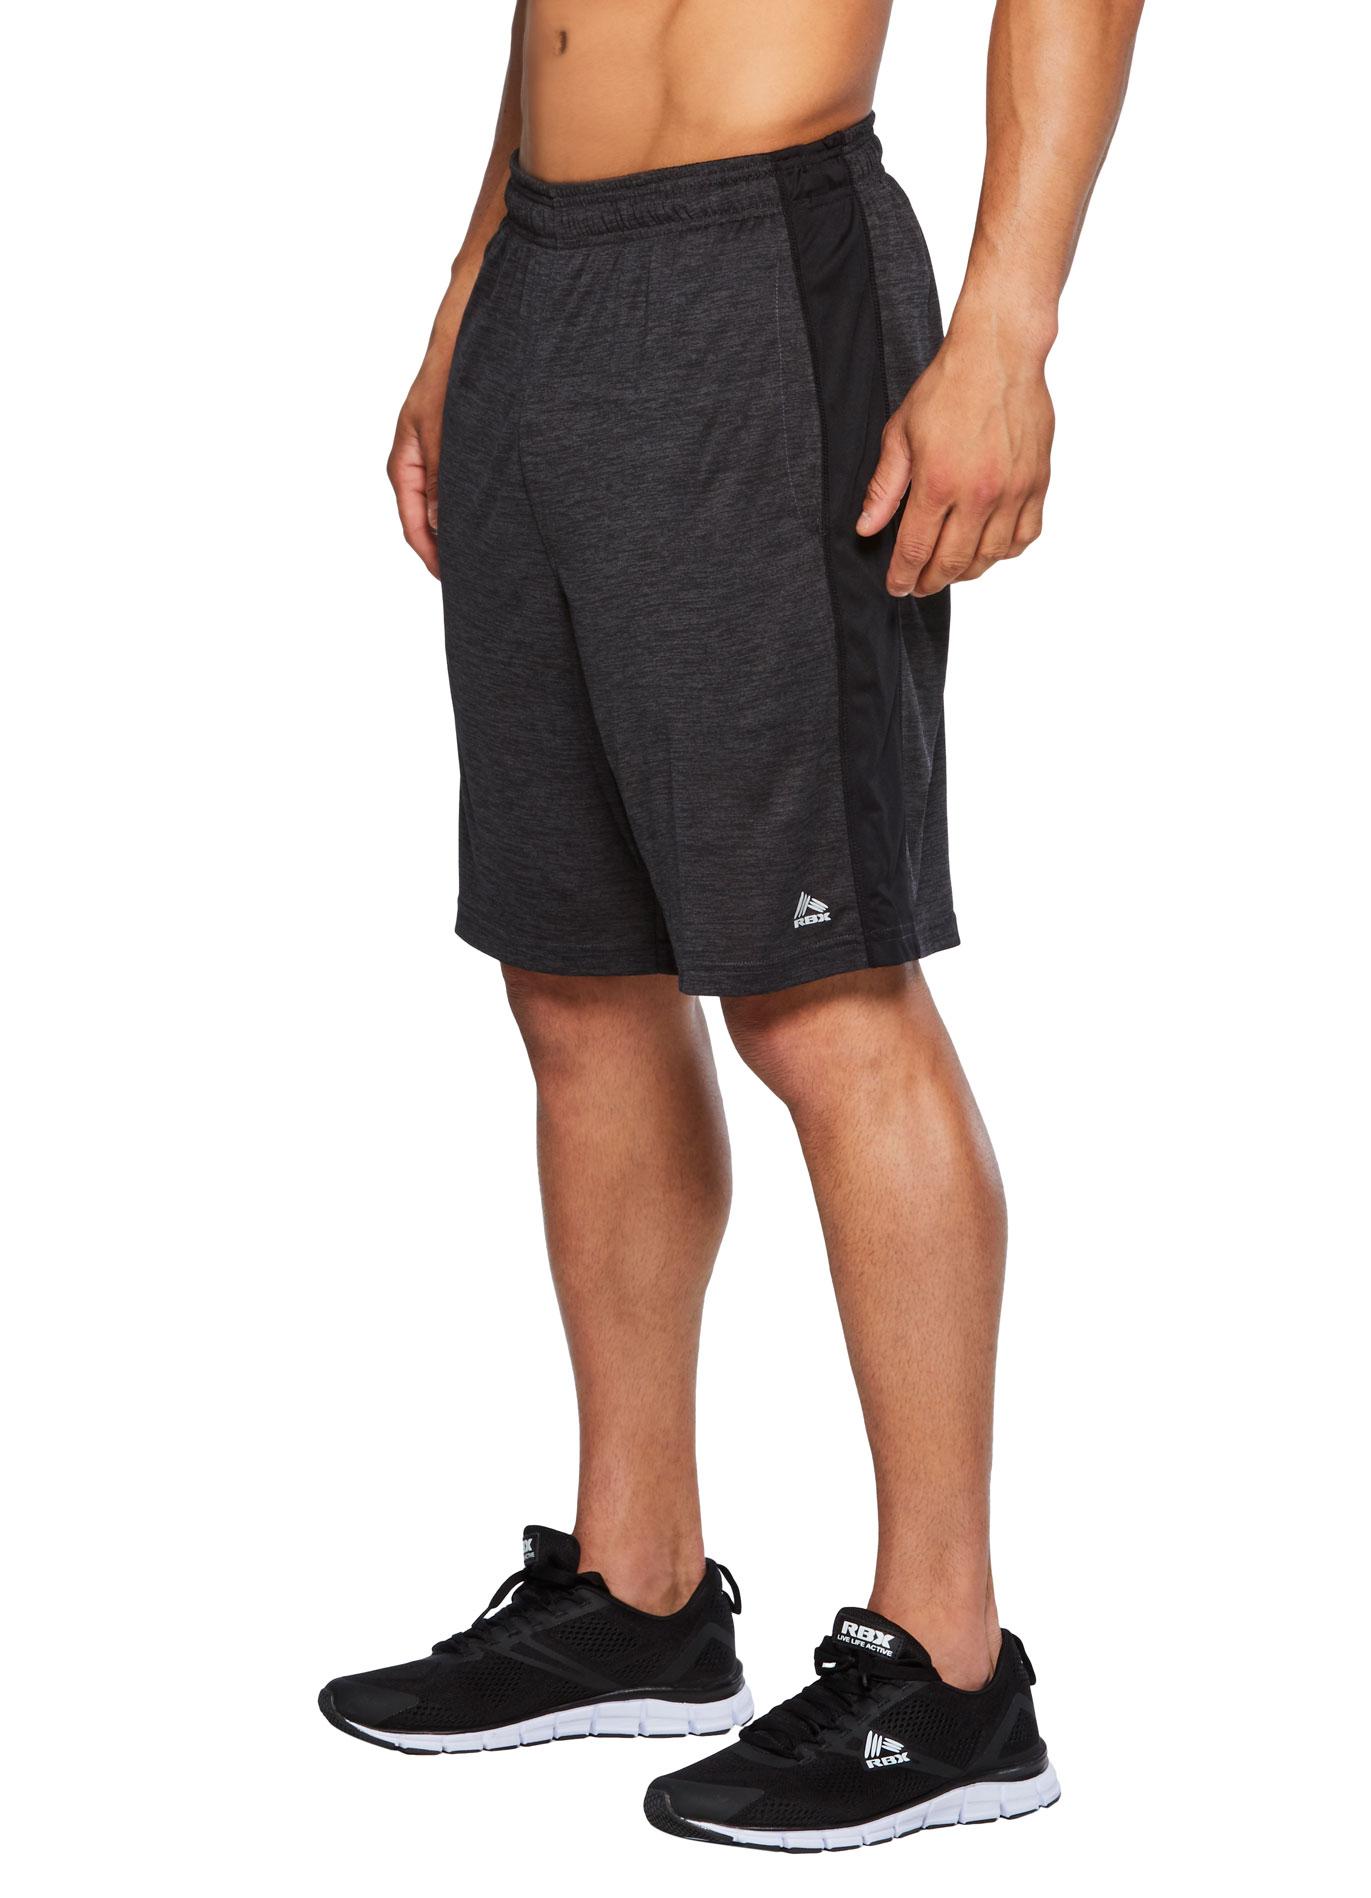 RBX Active Men's Double Dye Blocked Shorts w/Pockets